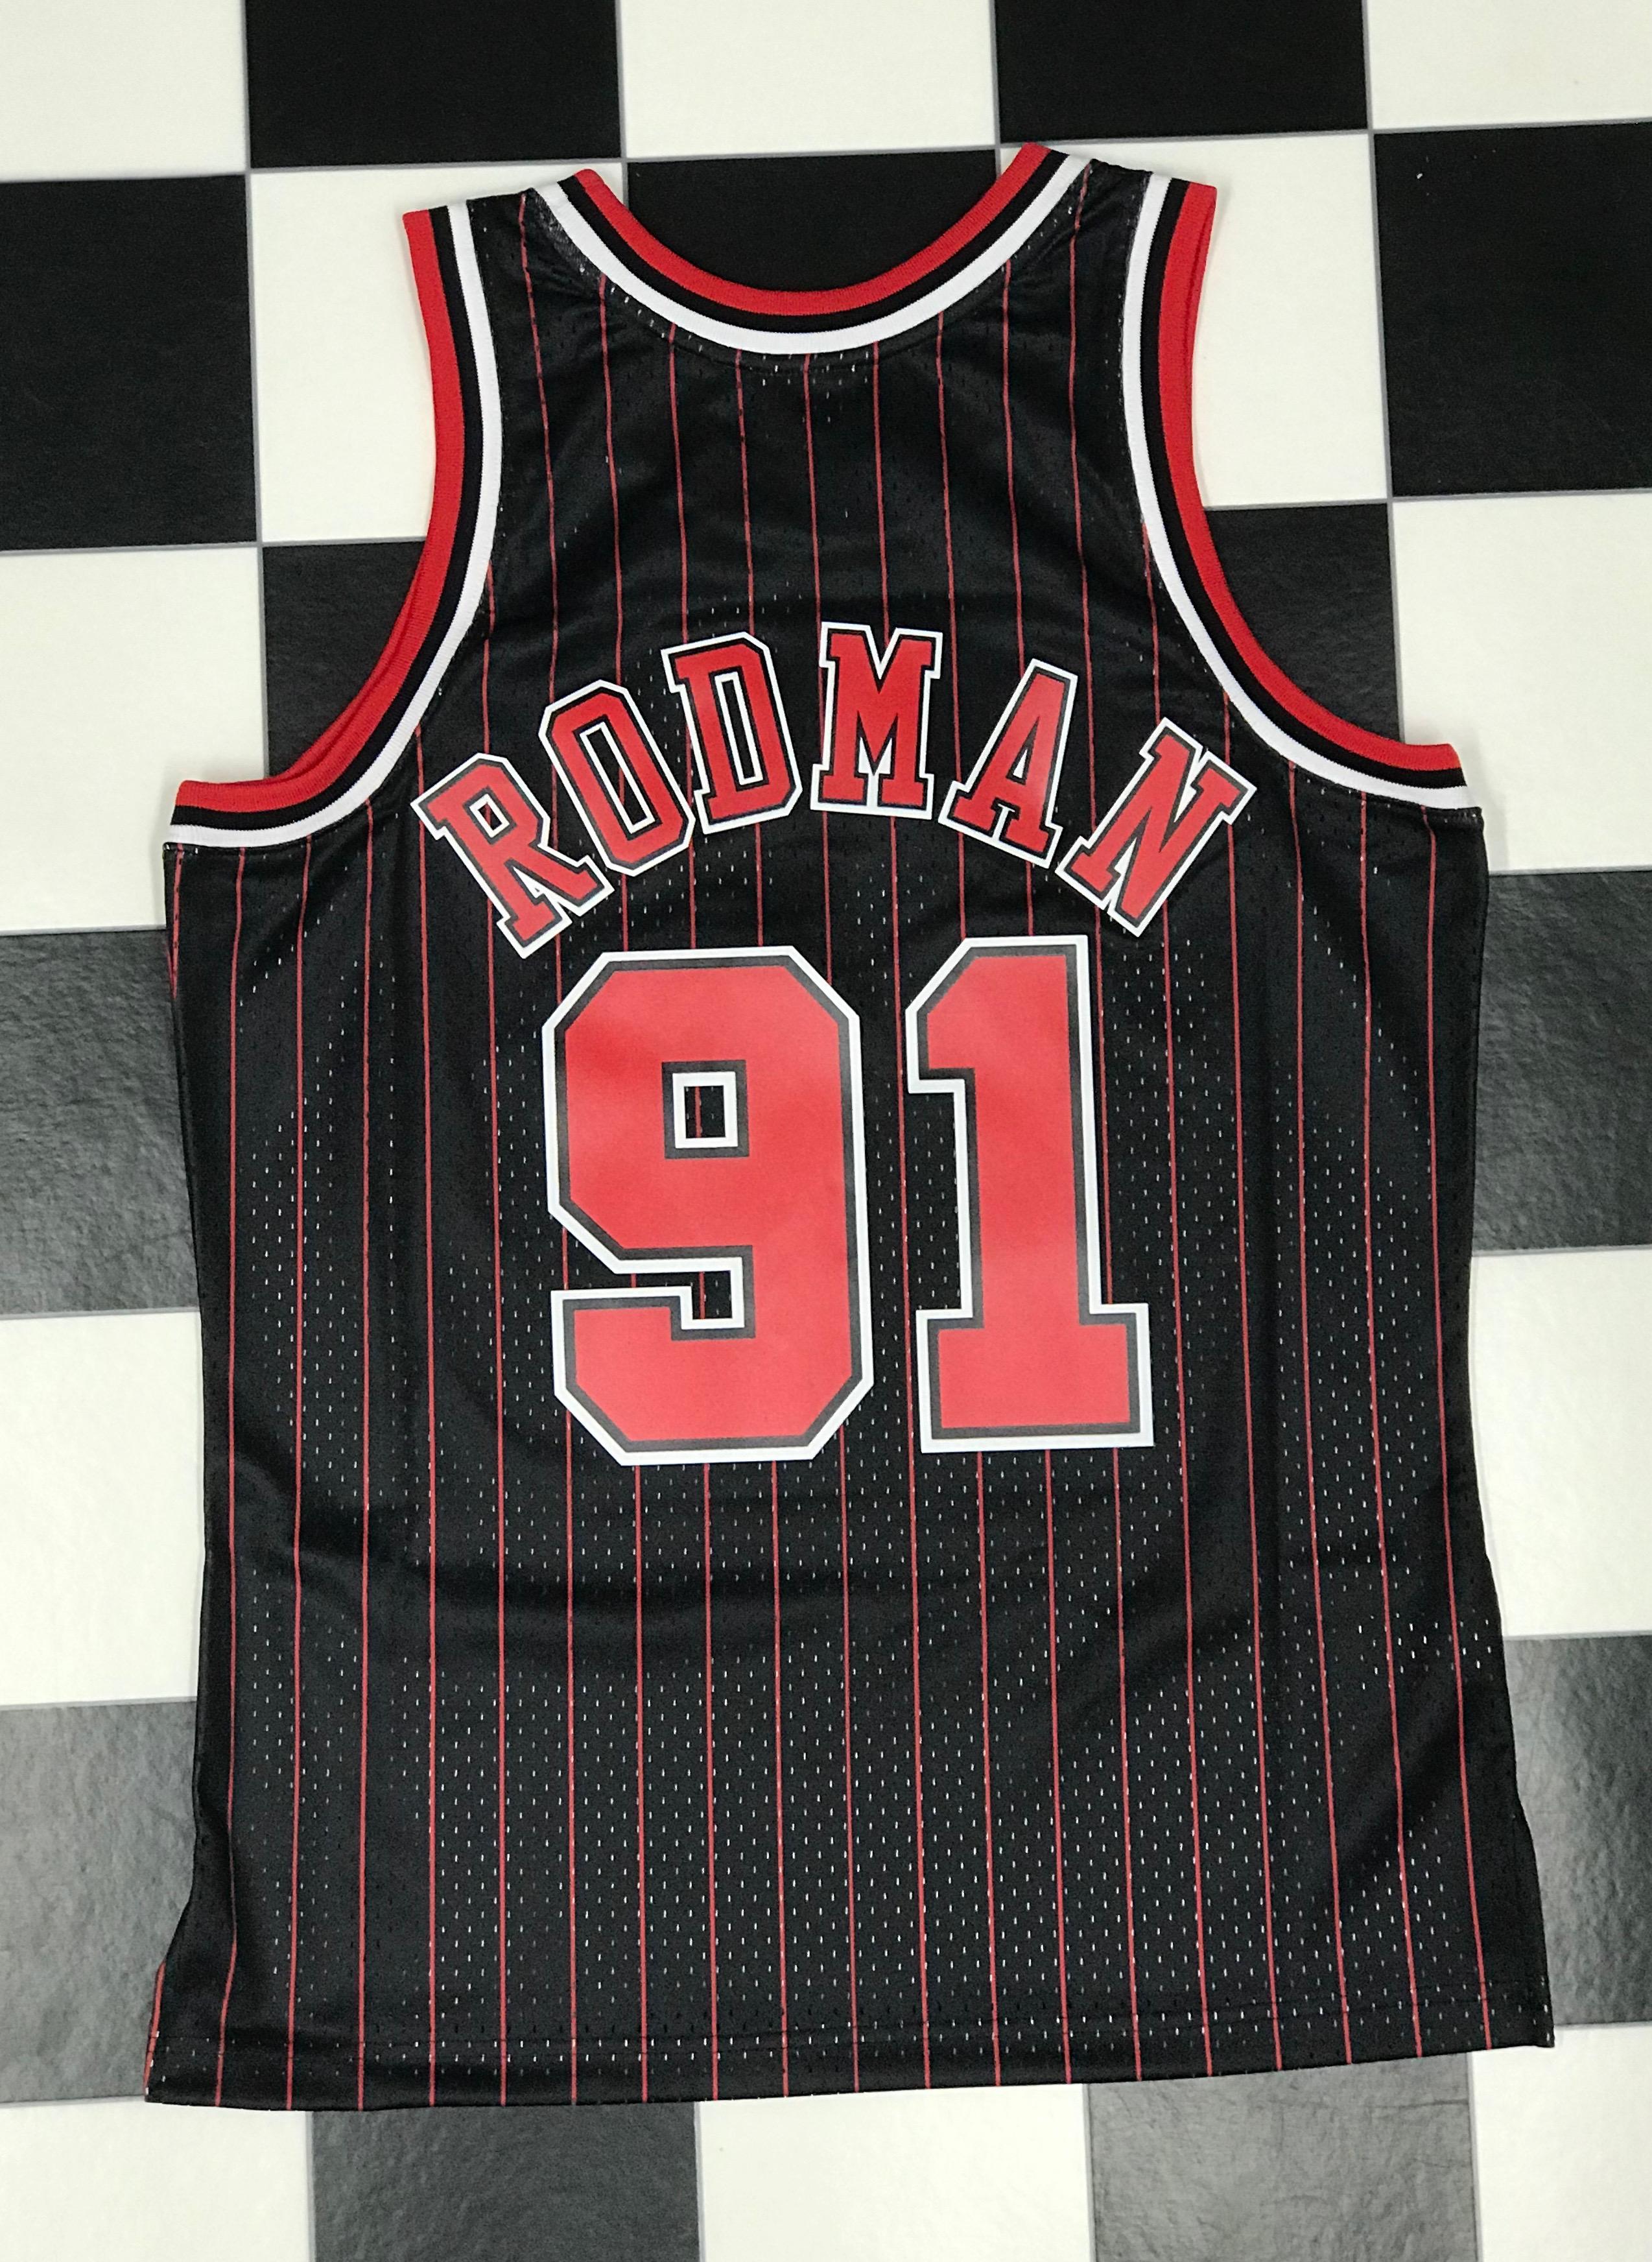 free shipping 99872 ffba0 Swingman Jersey Chicago Bulls Alternate 1995-96 Dennis ...